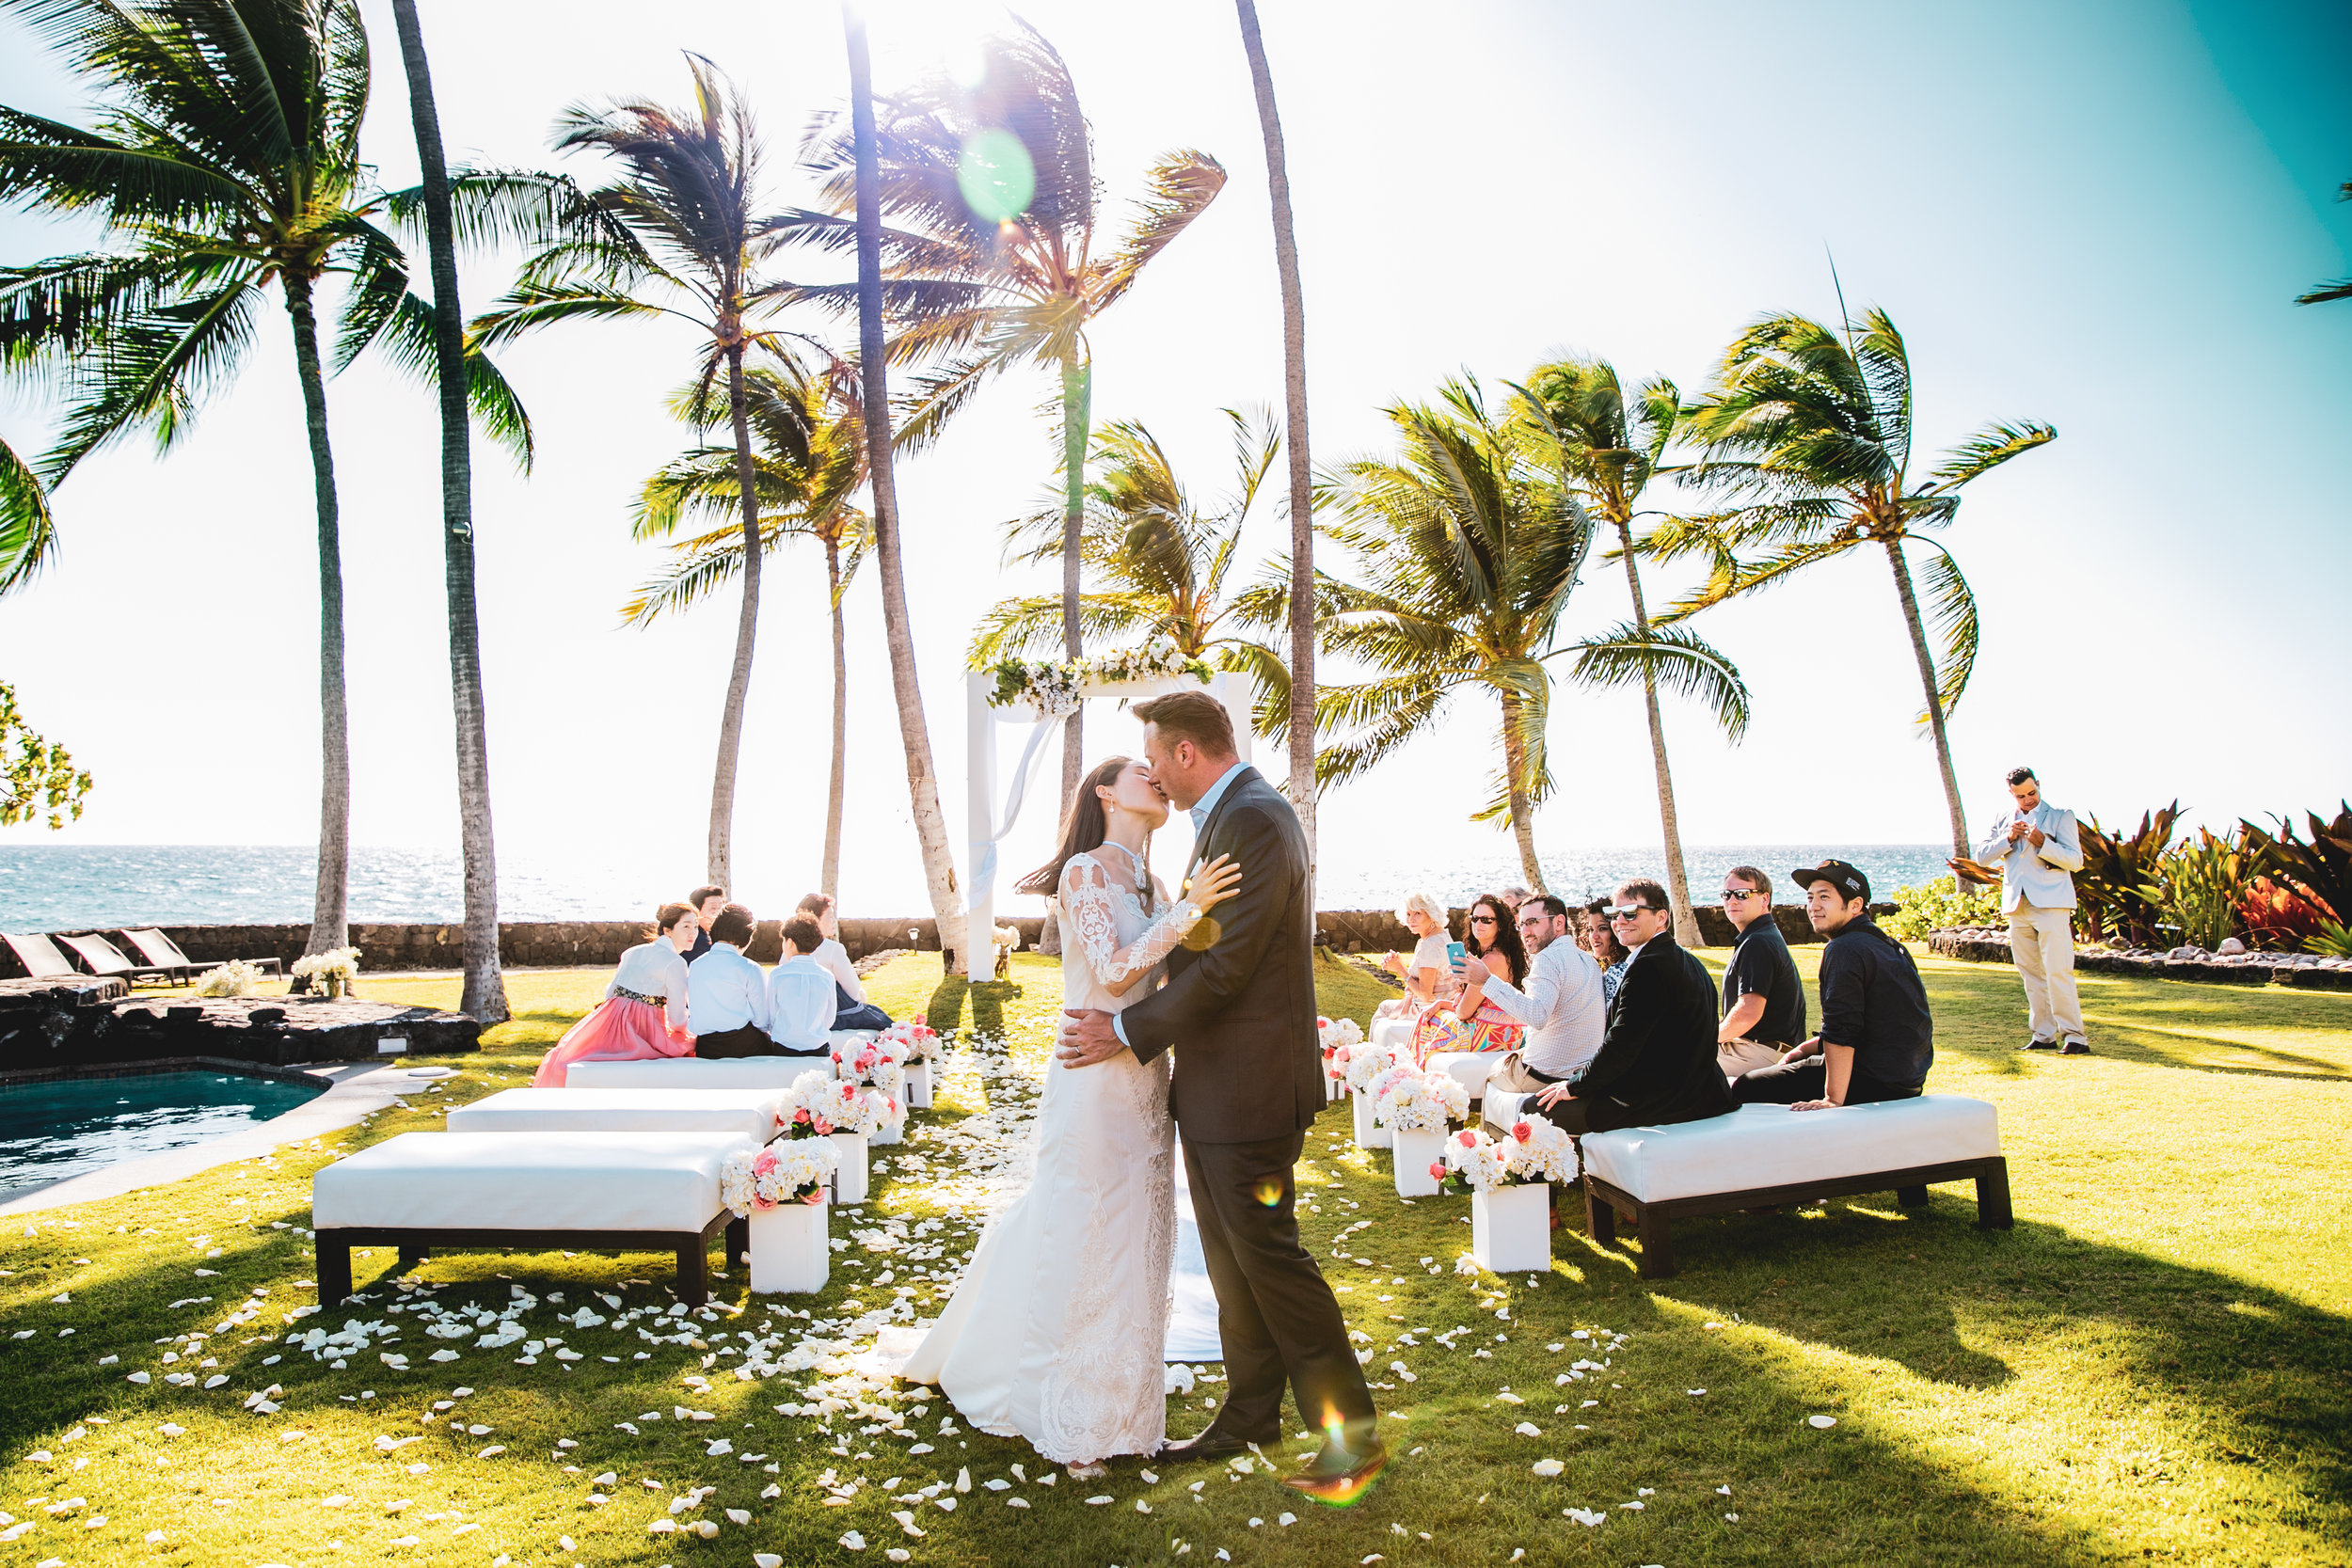 kelilina photography hawaii florida destination wedding photographer-39.jpg